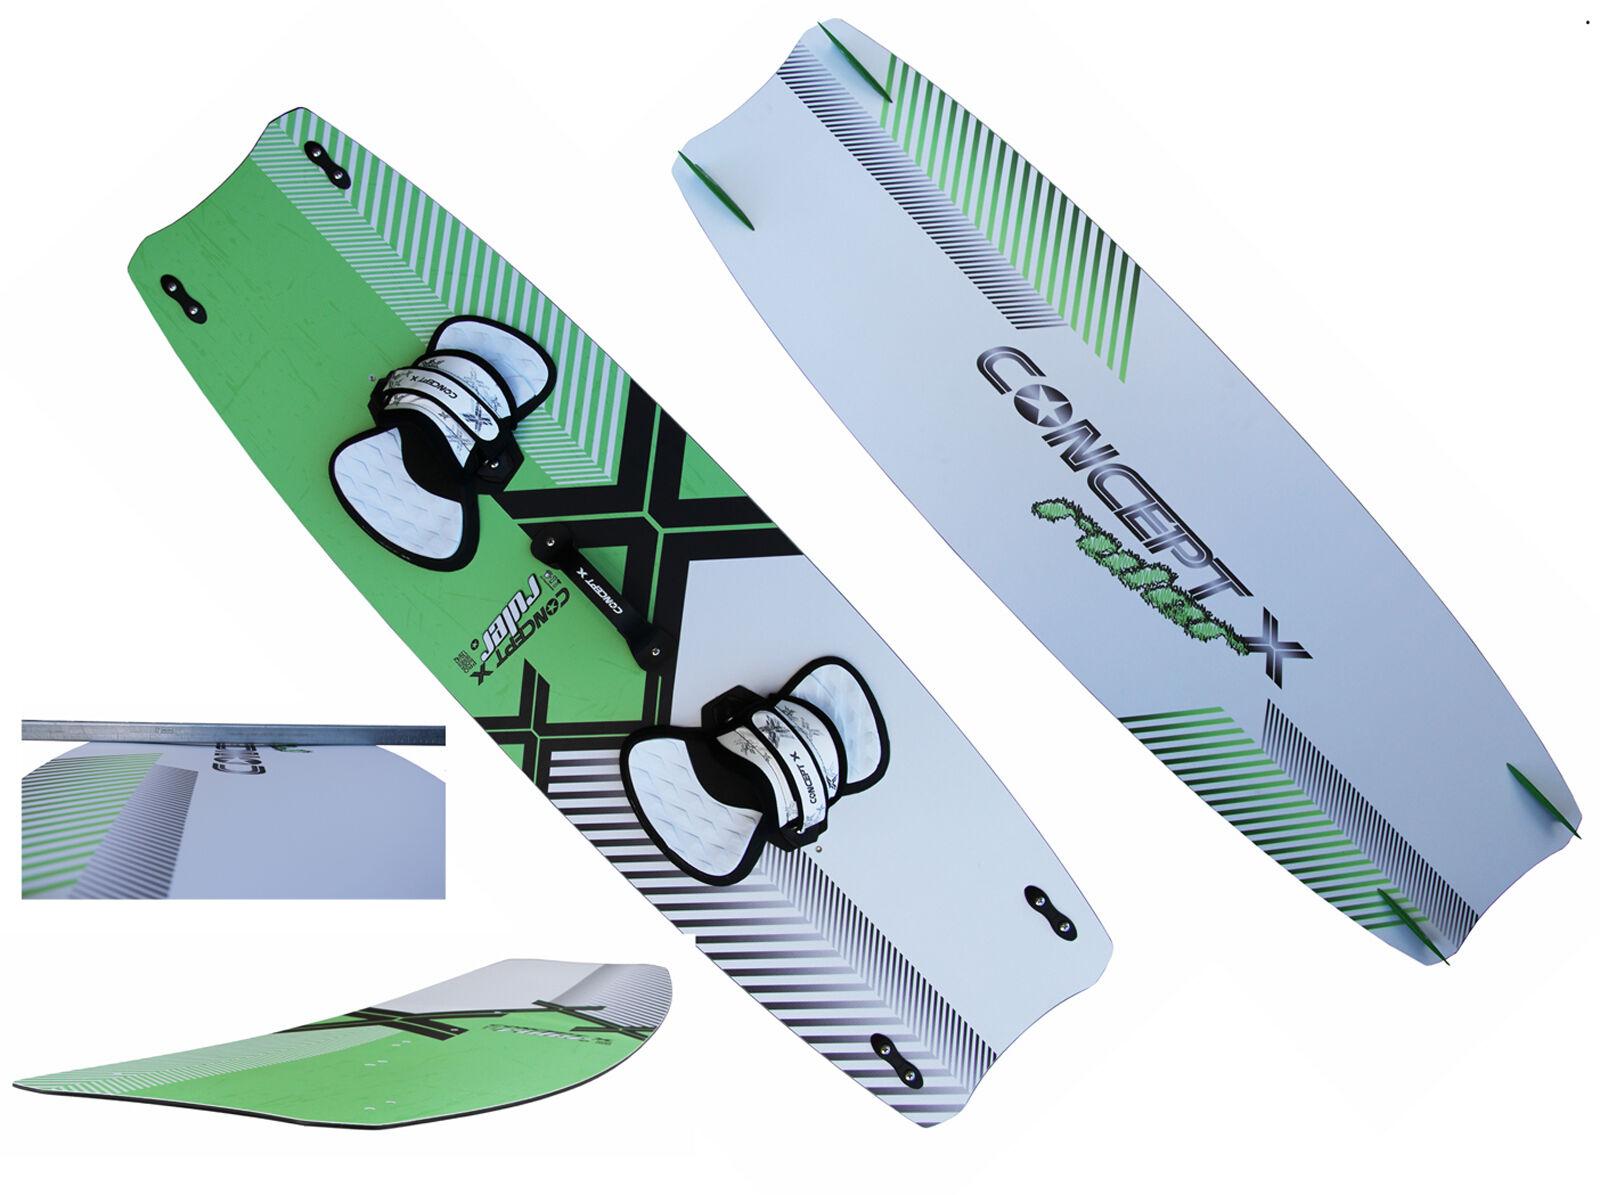 Concept X Kiteboard ; 45 145 cm x 45 ; cm; NUEVO Tabla de kite 4351cf